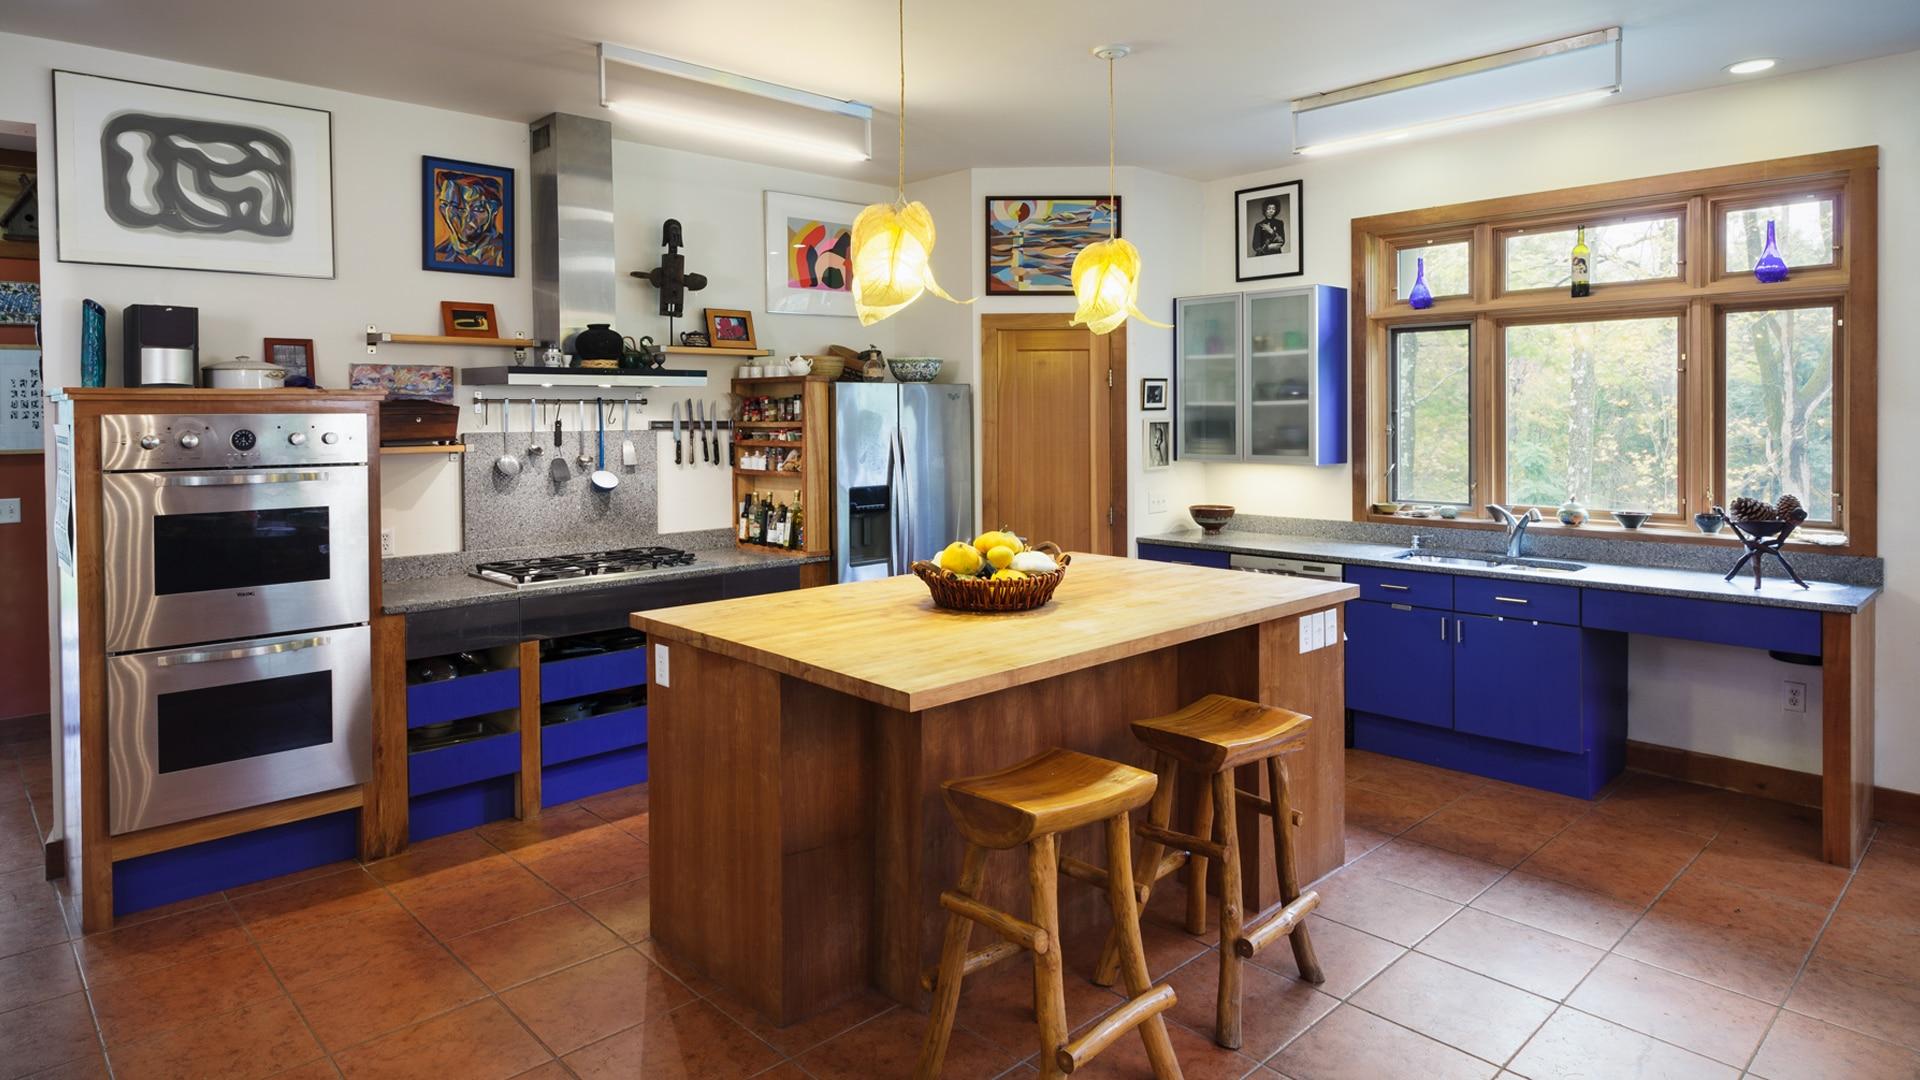 Energy Star Home U2013 Warwick, NY U2013 Case Study